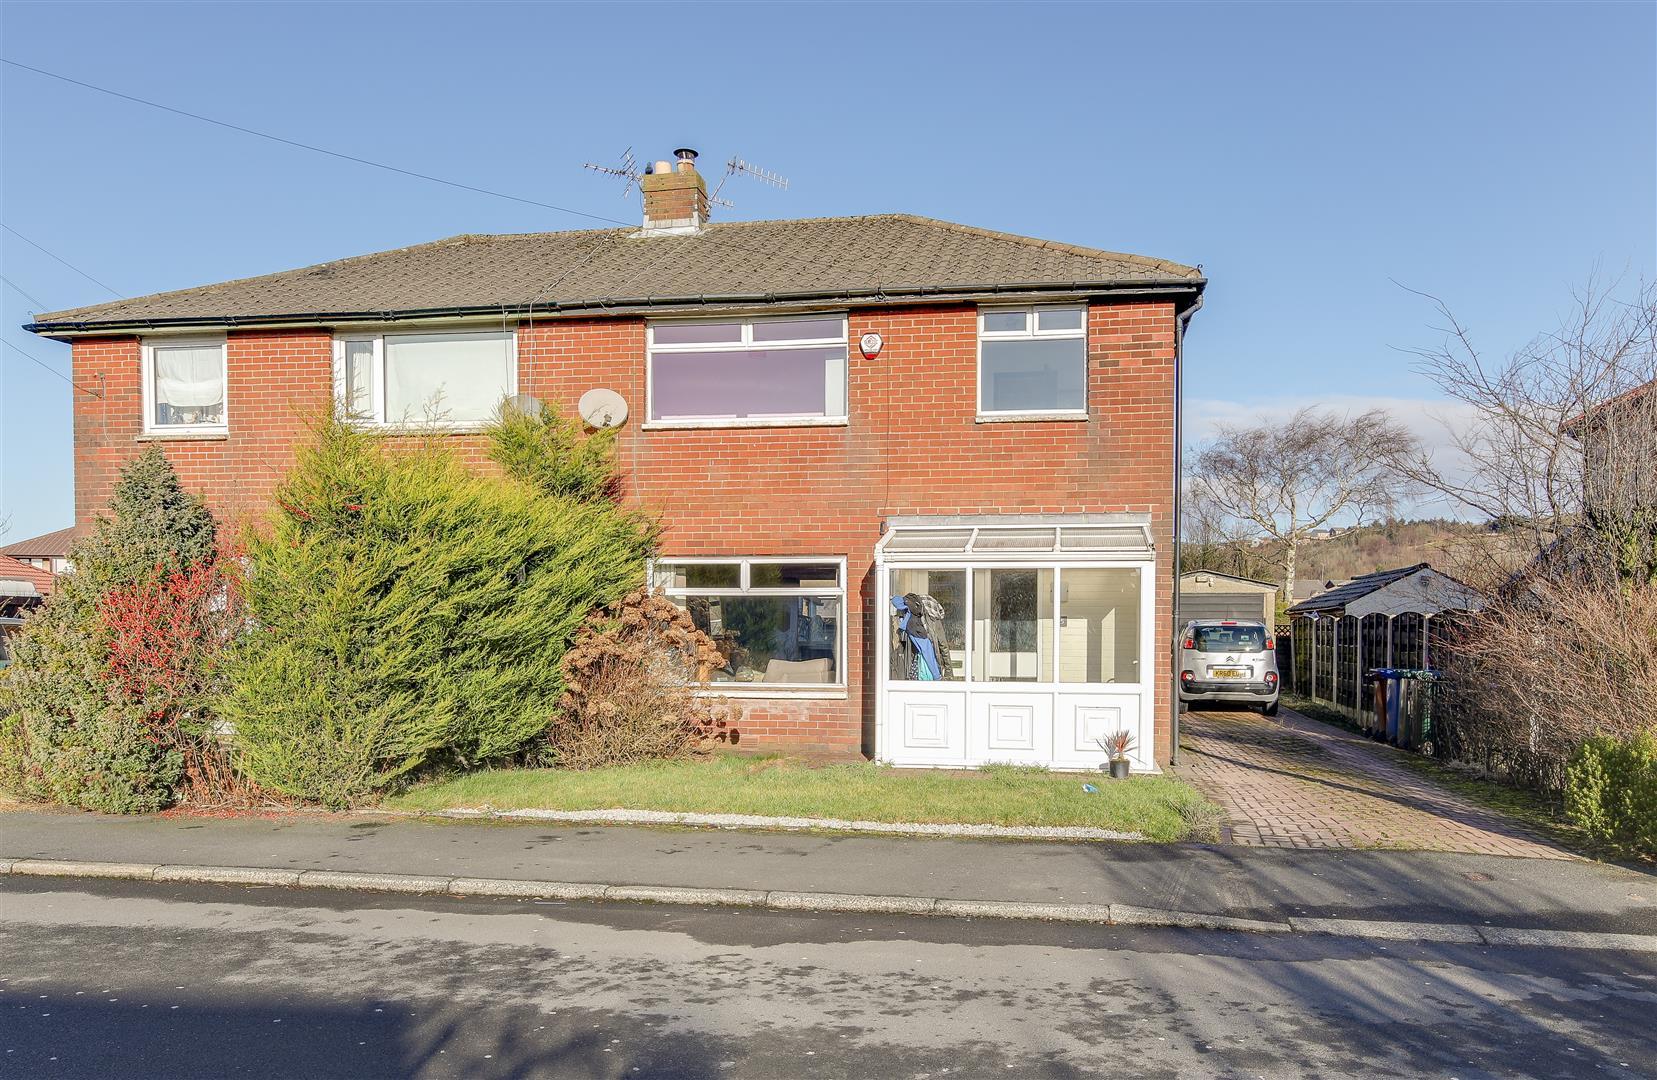 4 Bedrooms Semi Detached House for sale in Grasmere Road, Haslingden, Rossendale